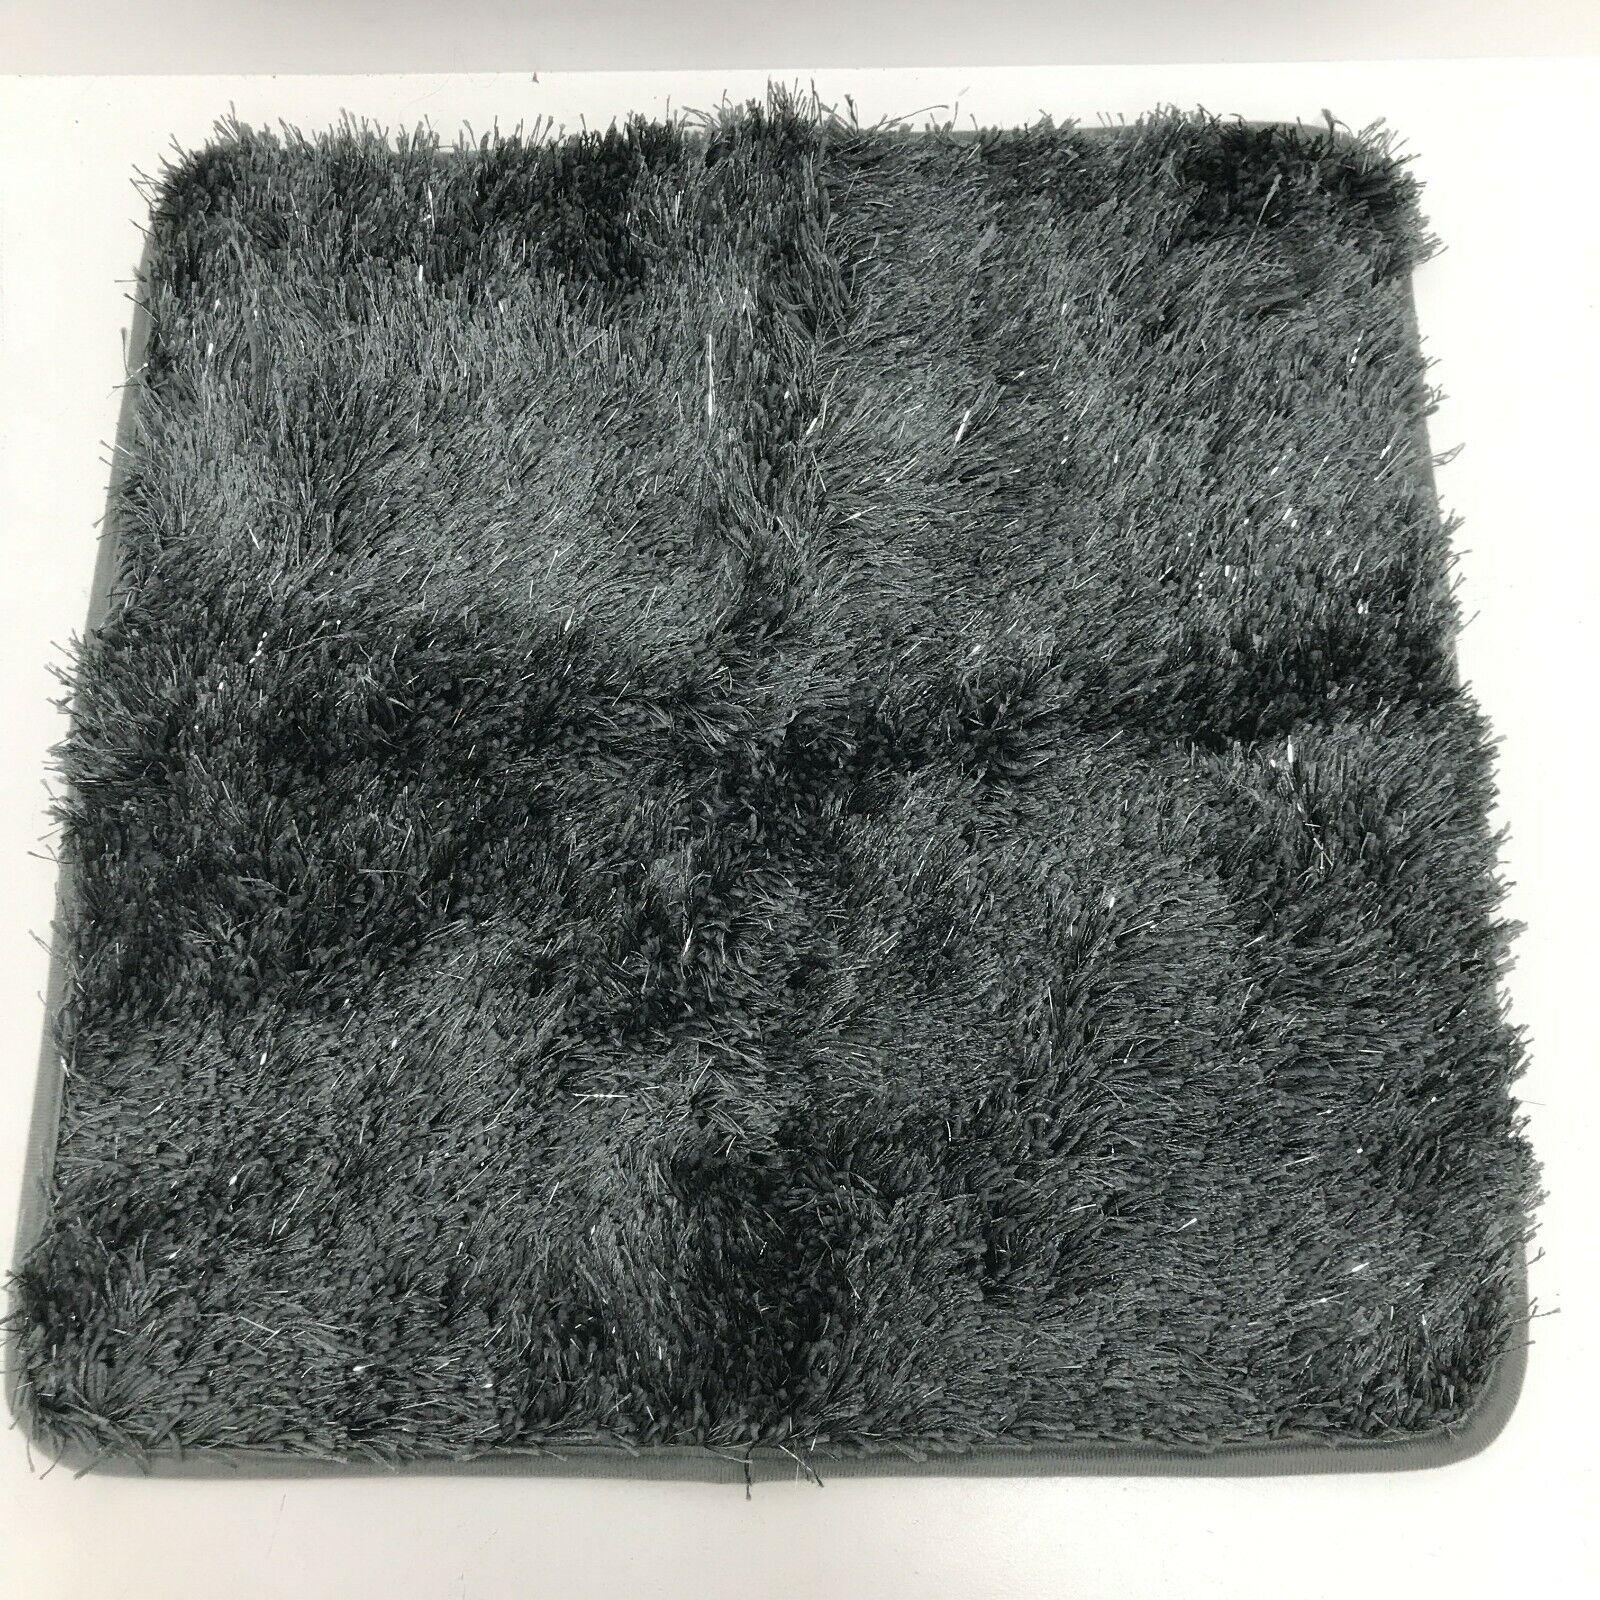 New Next Bath Shower Mat Home Grey Charcoal Sparkle Bathroom Long Pile 261388